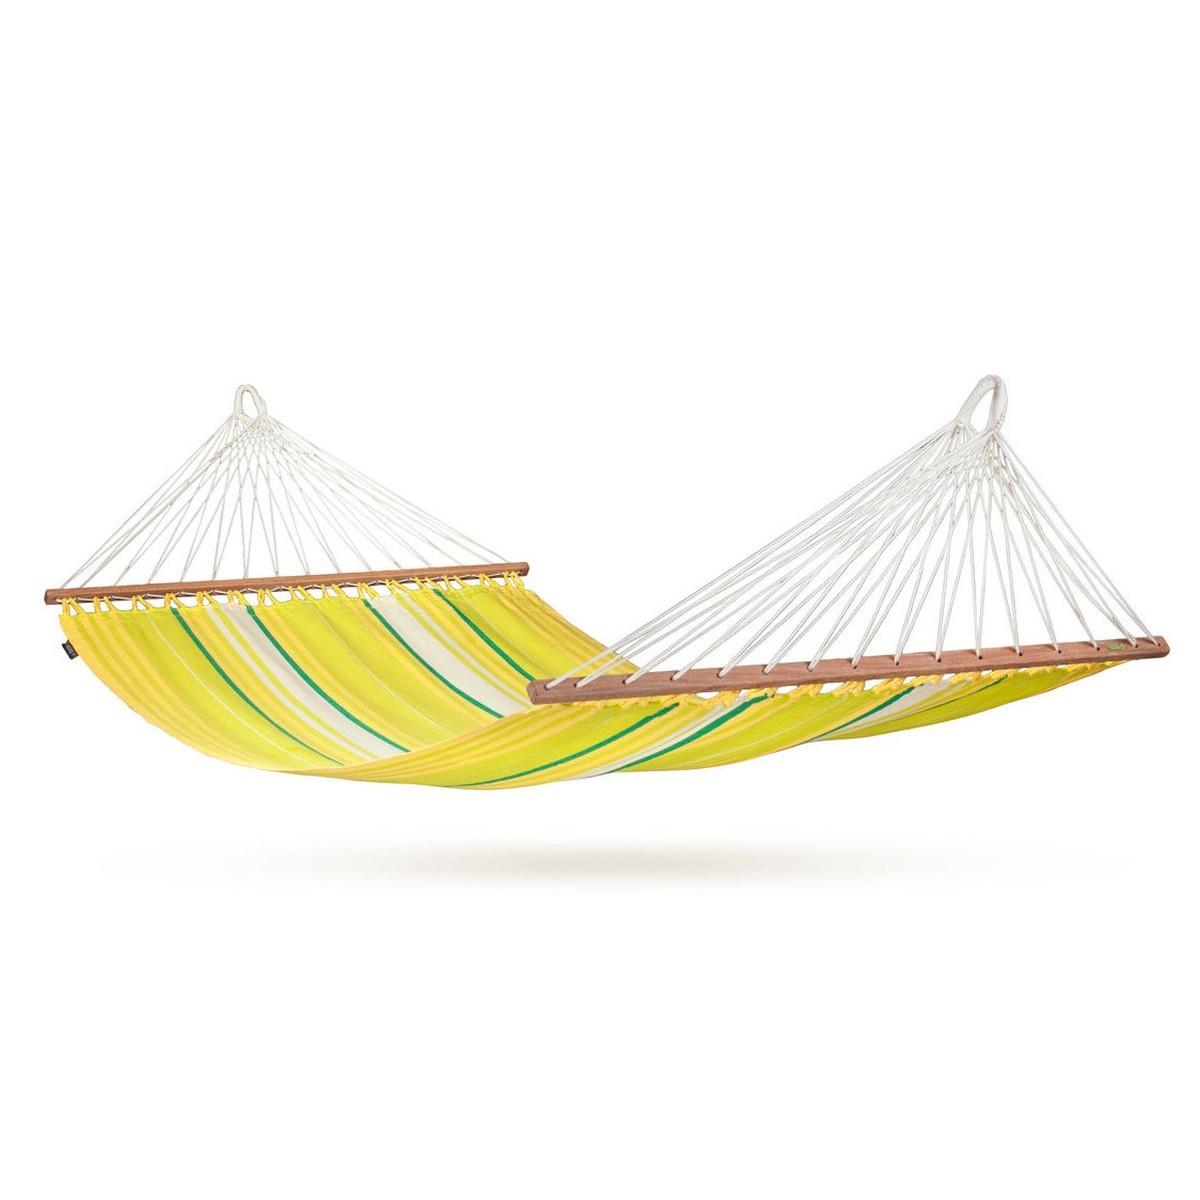 la siesta hamac barres simple isle a lemon. Black Bedroom Furniture Sets. Home Design Ideas